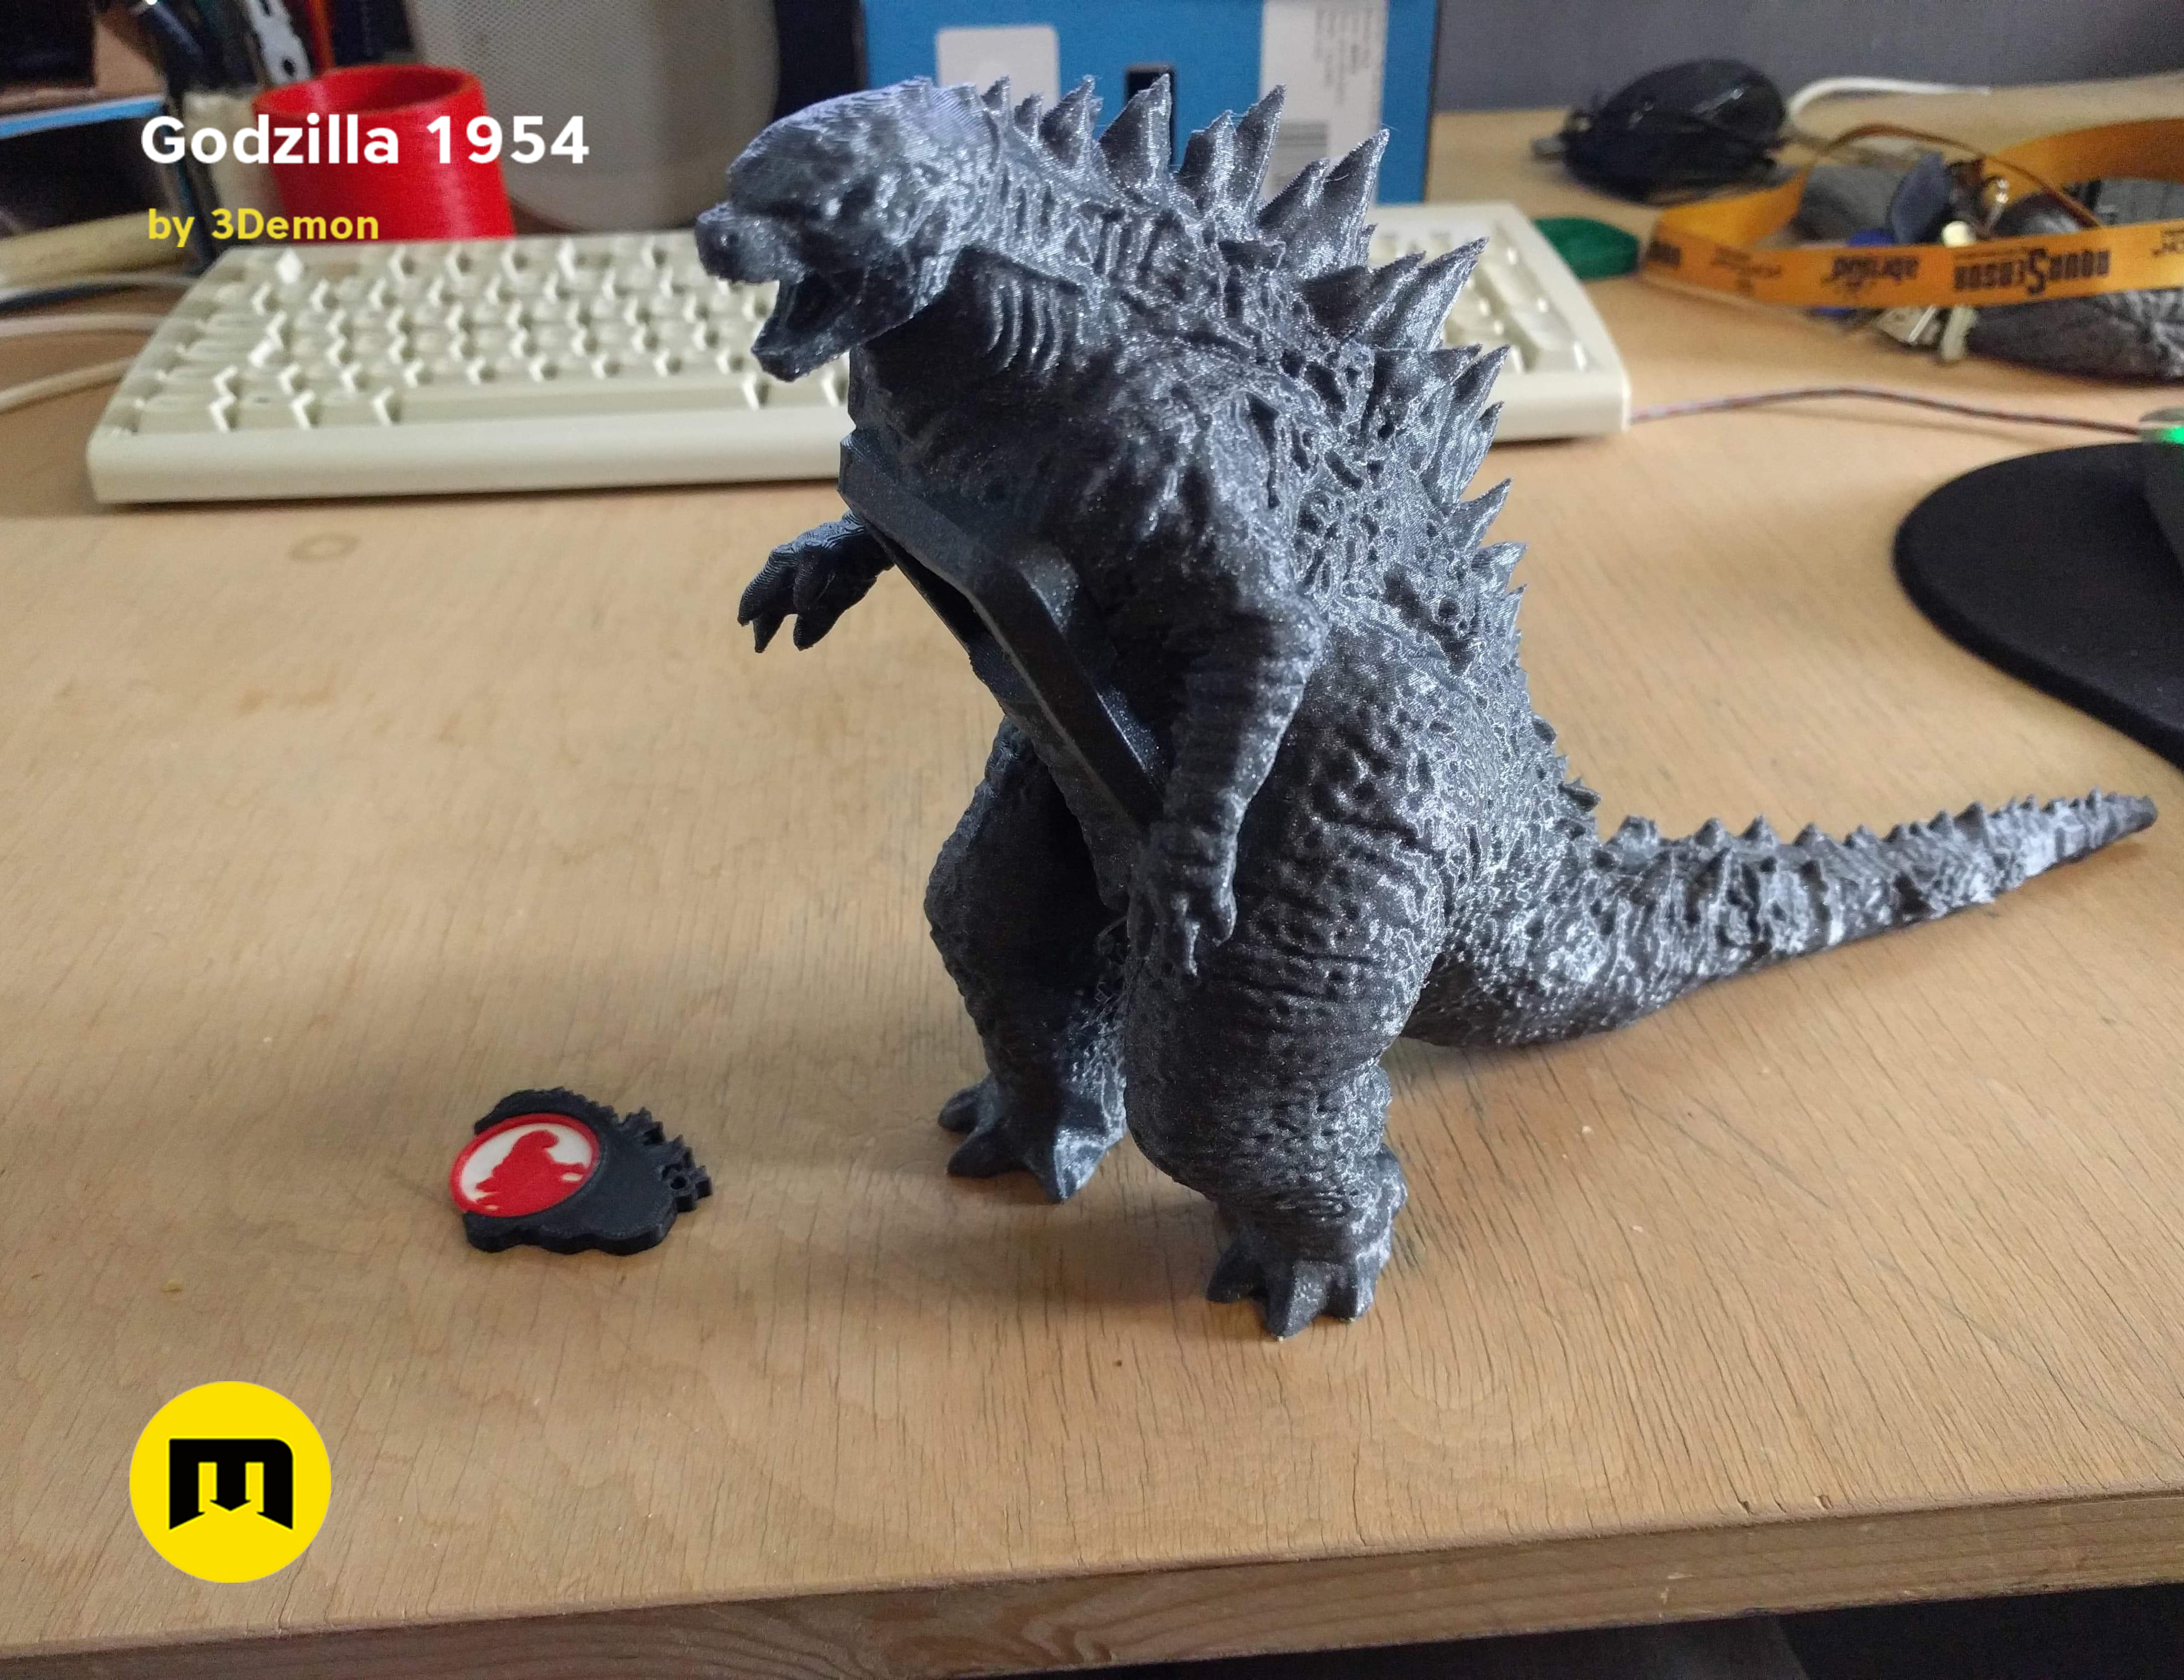 received_361314191262999.png Download free OBJ file Godzilla 1954 figure and bottle opener • 3D printer model, 3D-mon